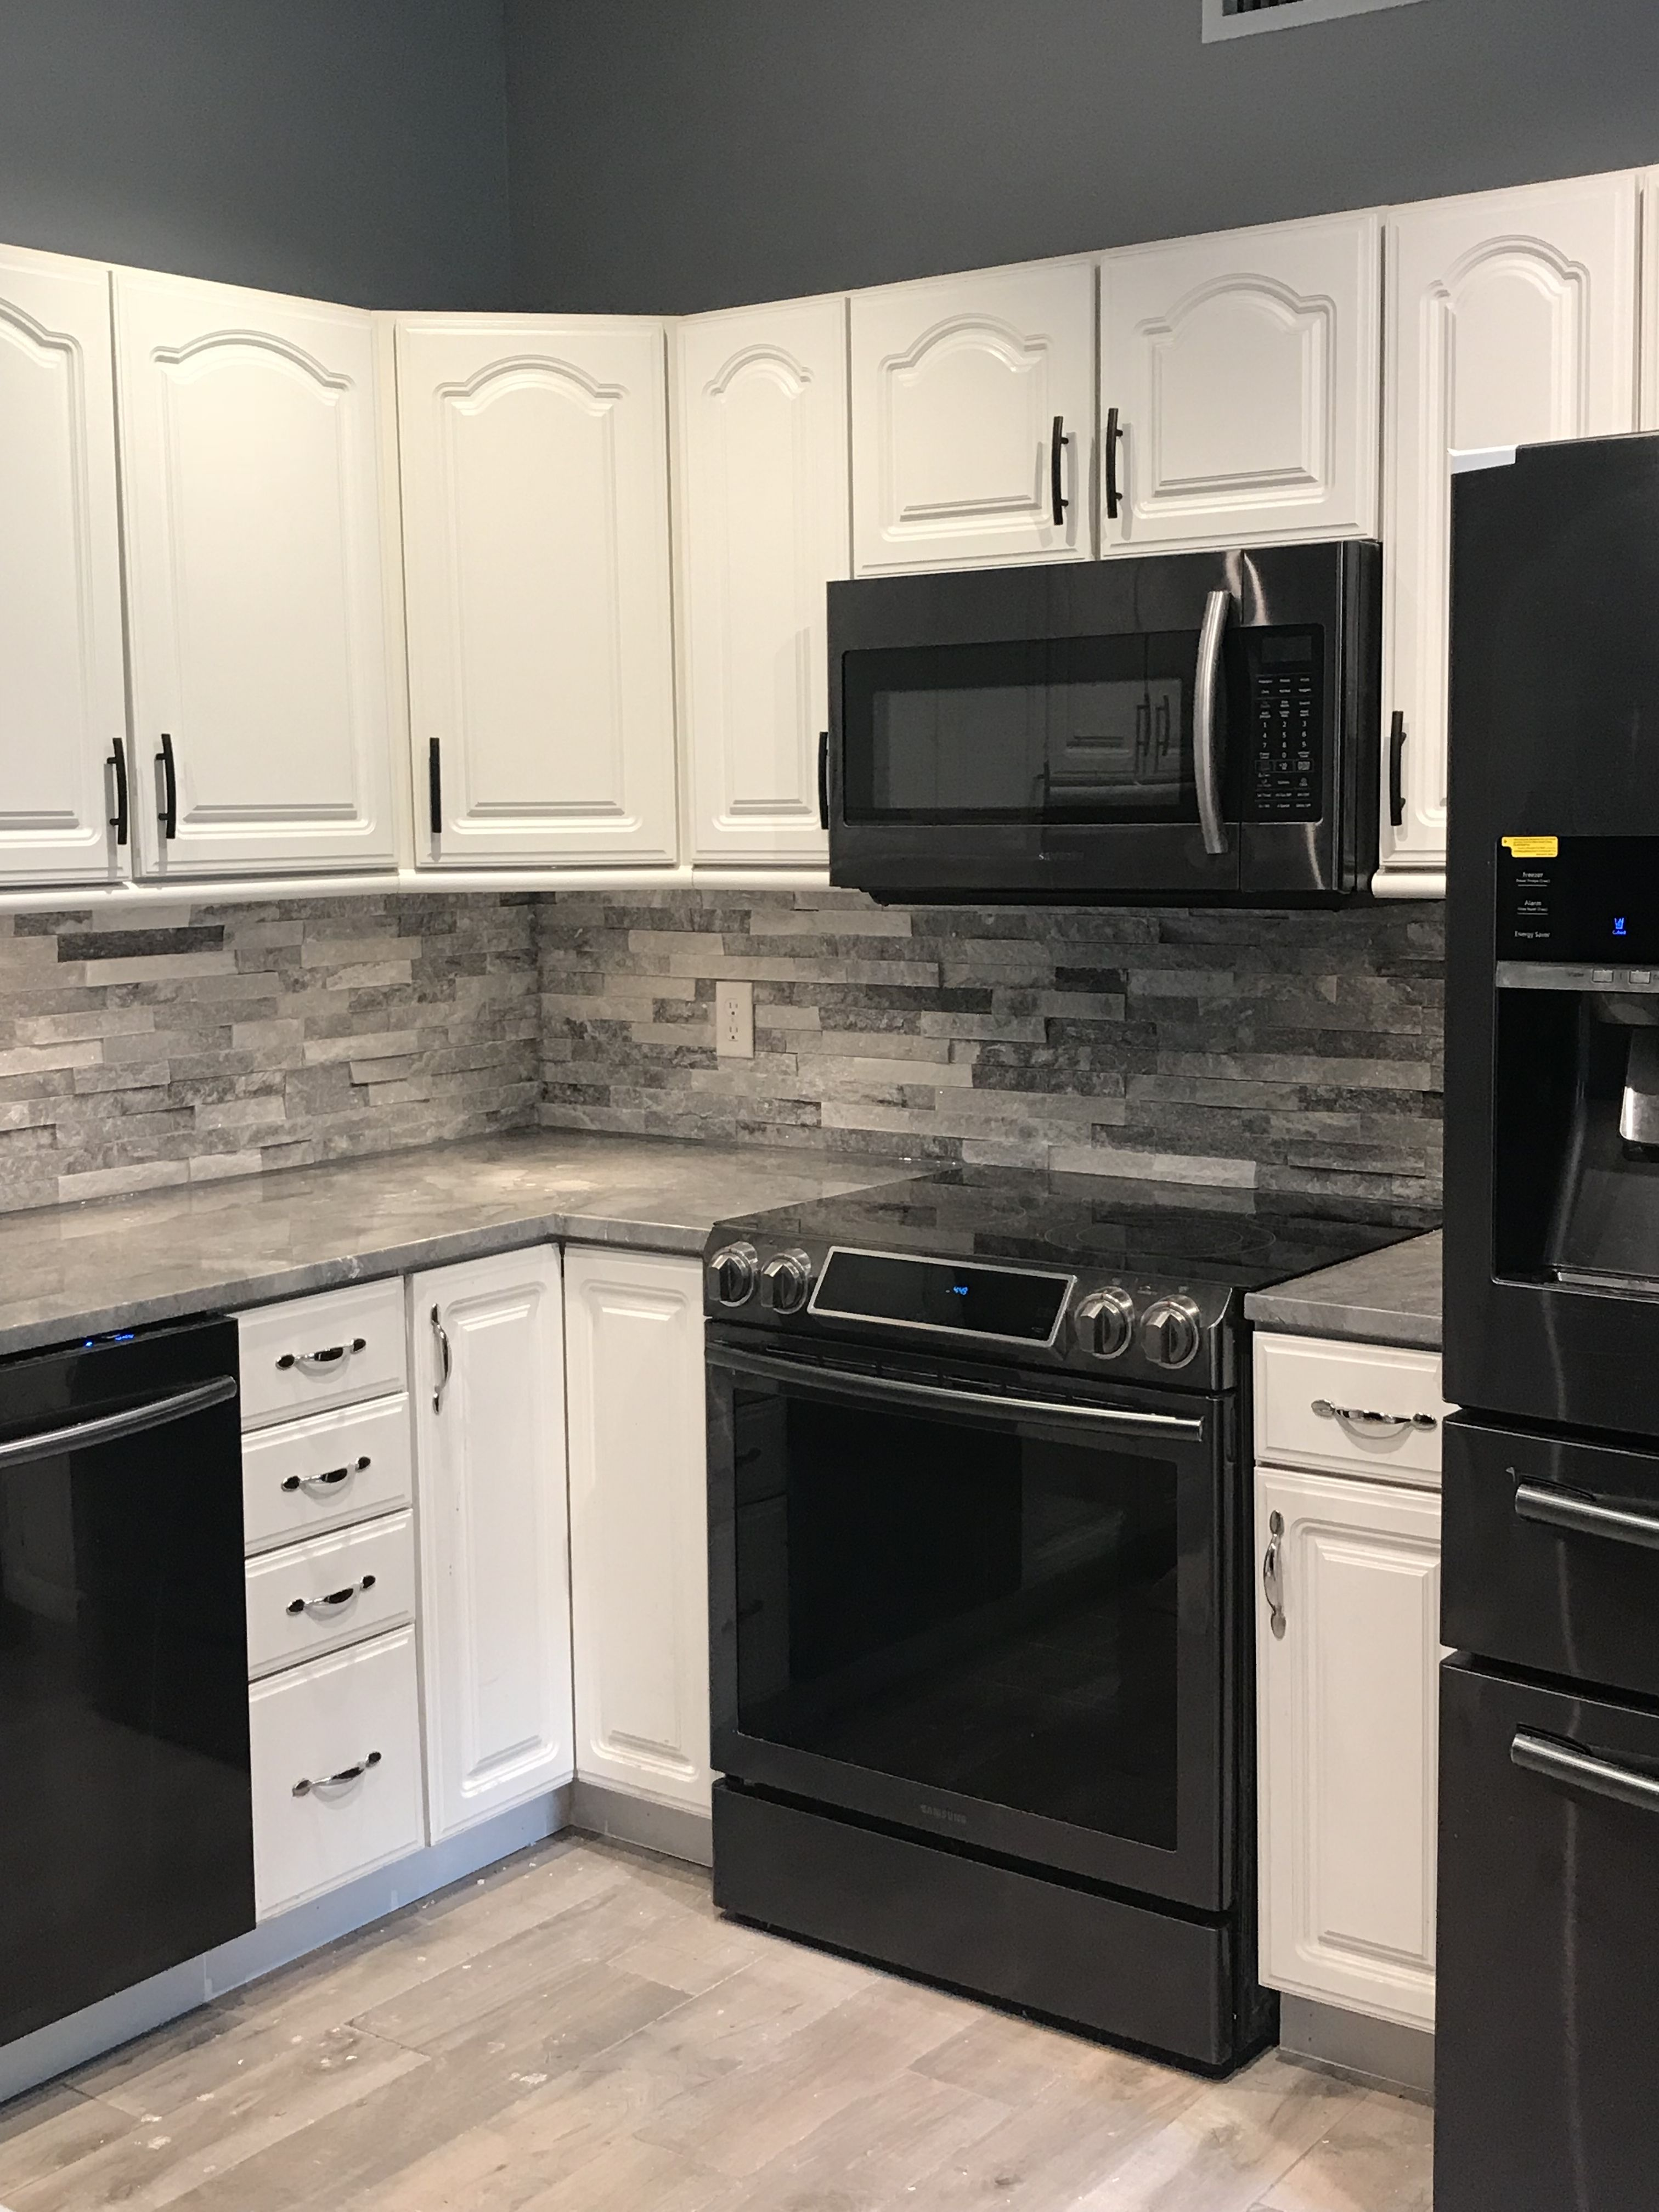 stackstone backsplash black stainless appliances white cabinets grey granite dona on kitchen appliances id=25580